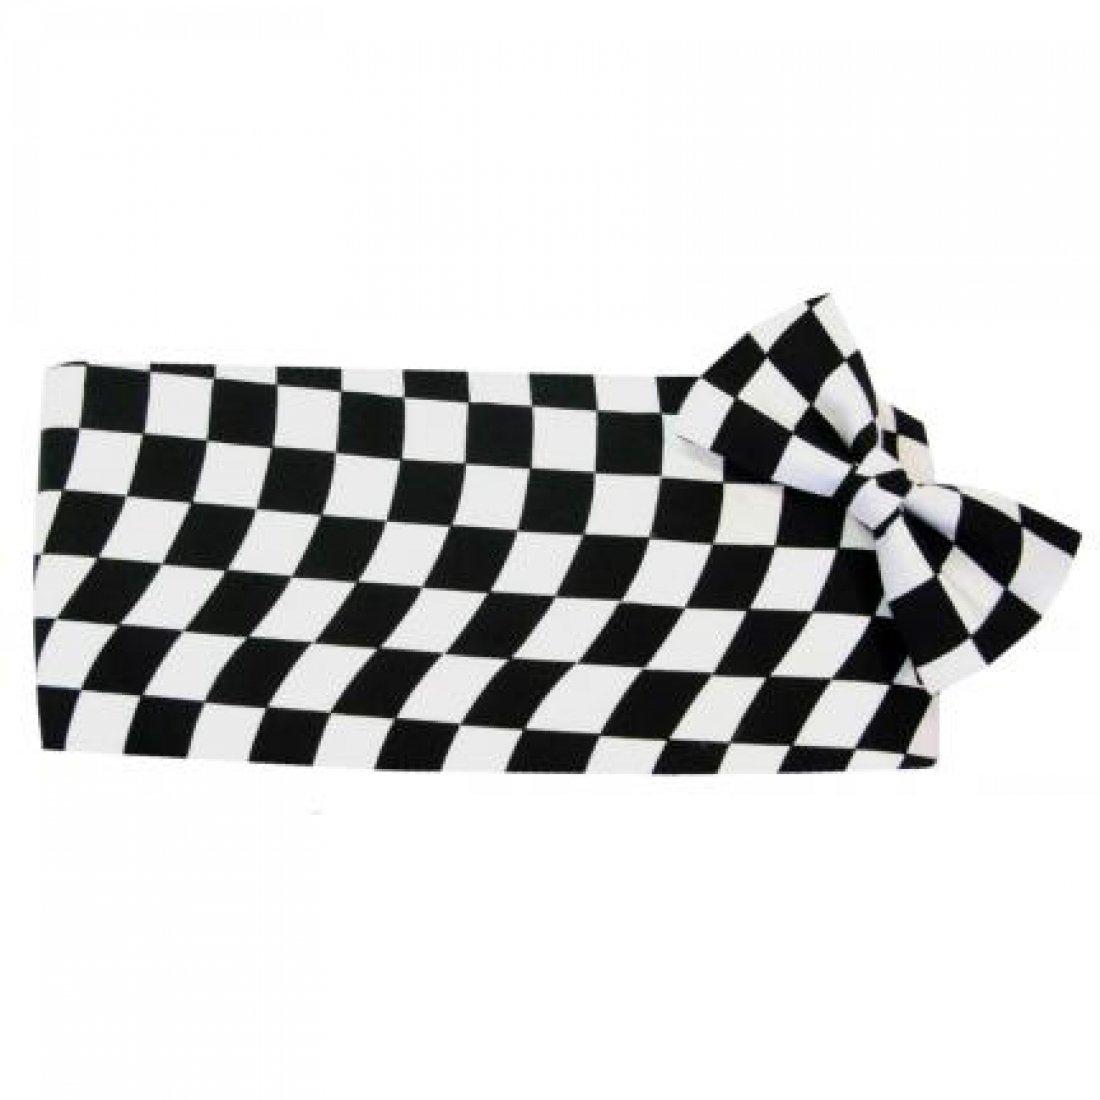 Wavy Victory Racing Flag Tuxedo Cummerbund and Bow Tie by David's Formal Wear